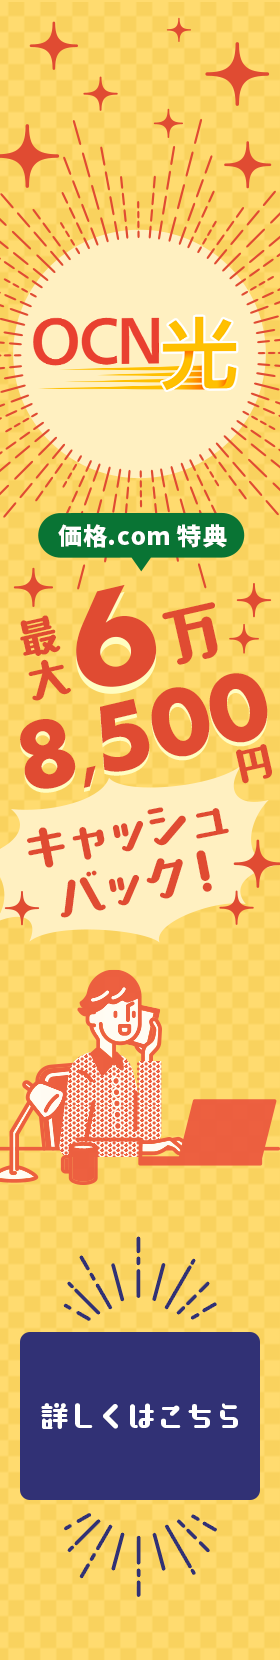 OCN光 価格.com特典 最大68,500円キャッシュバック!